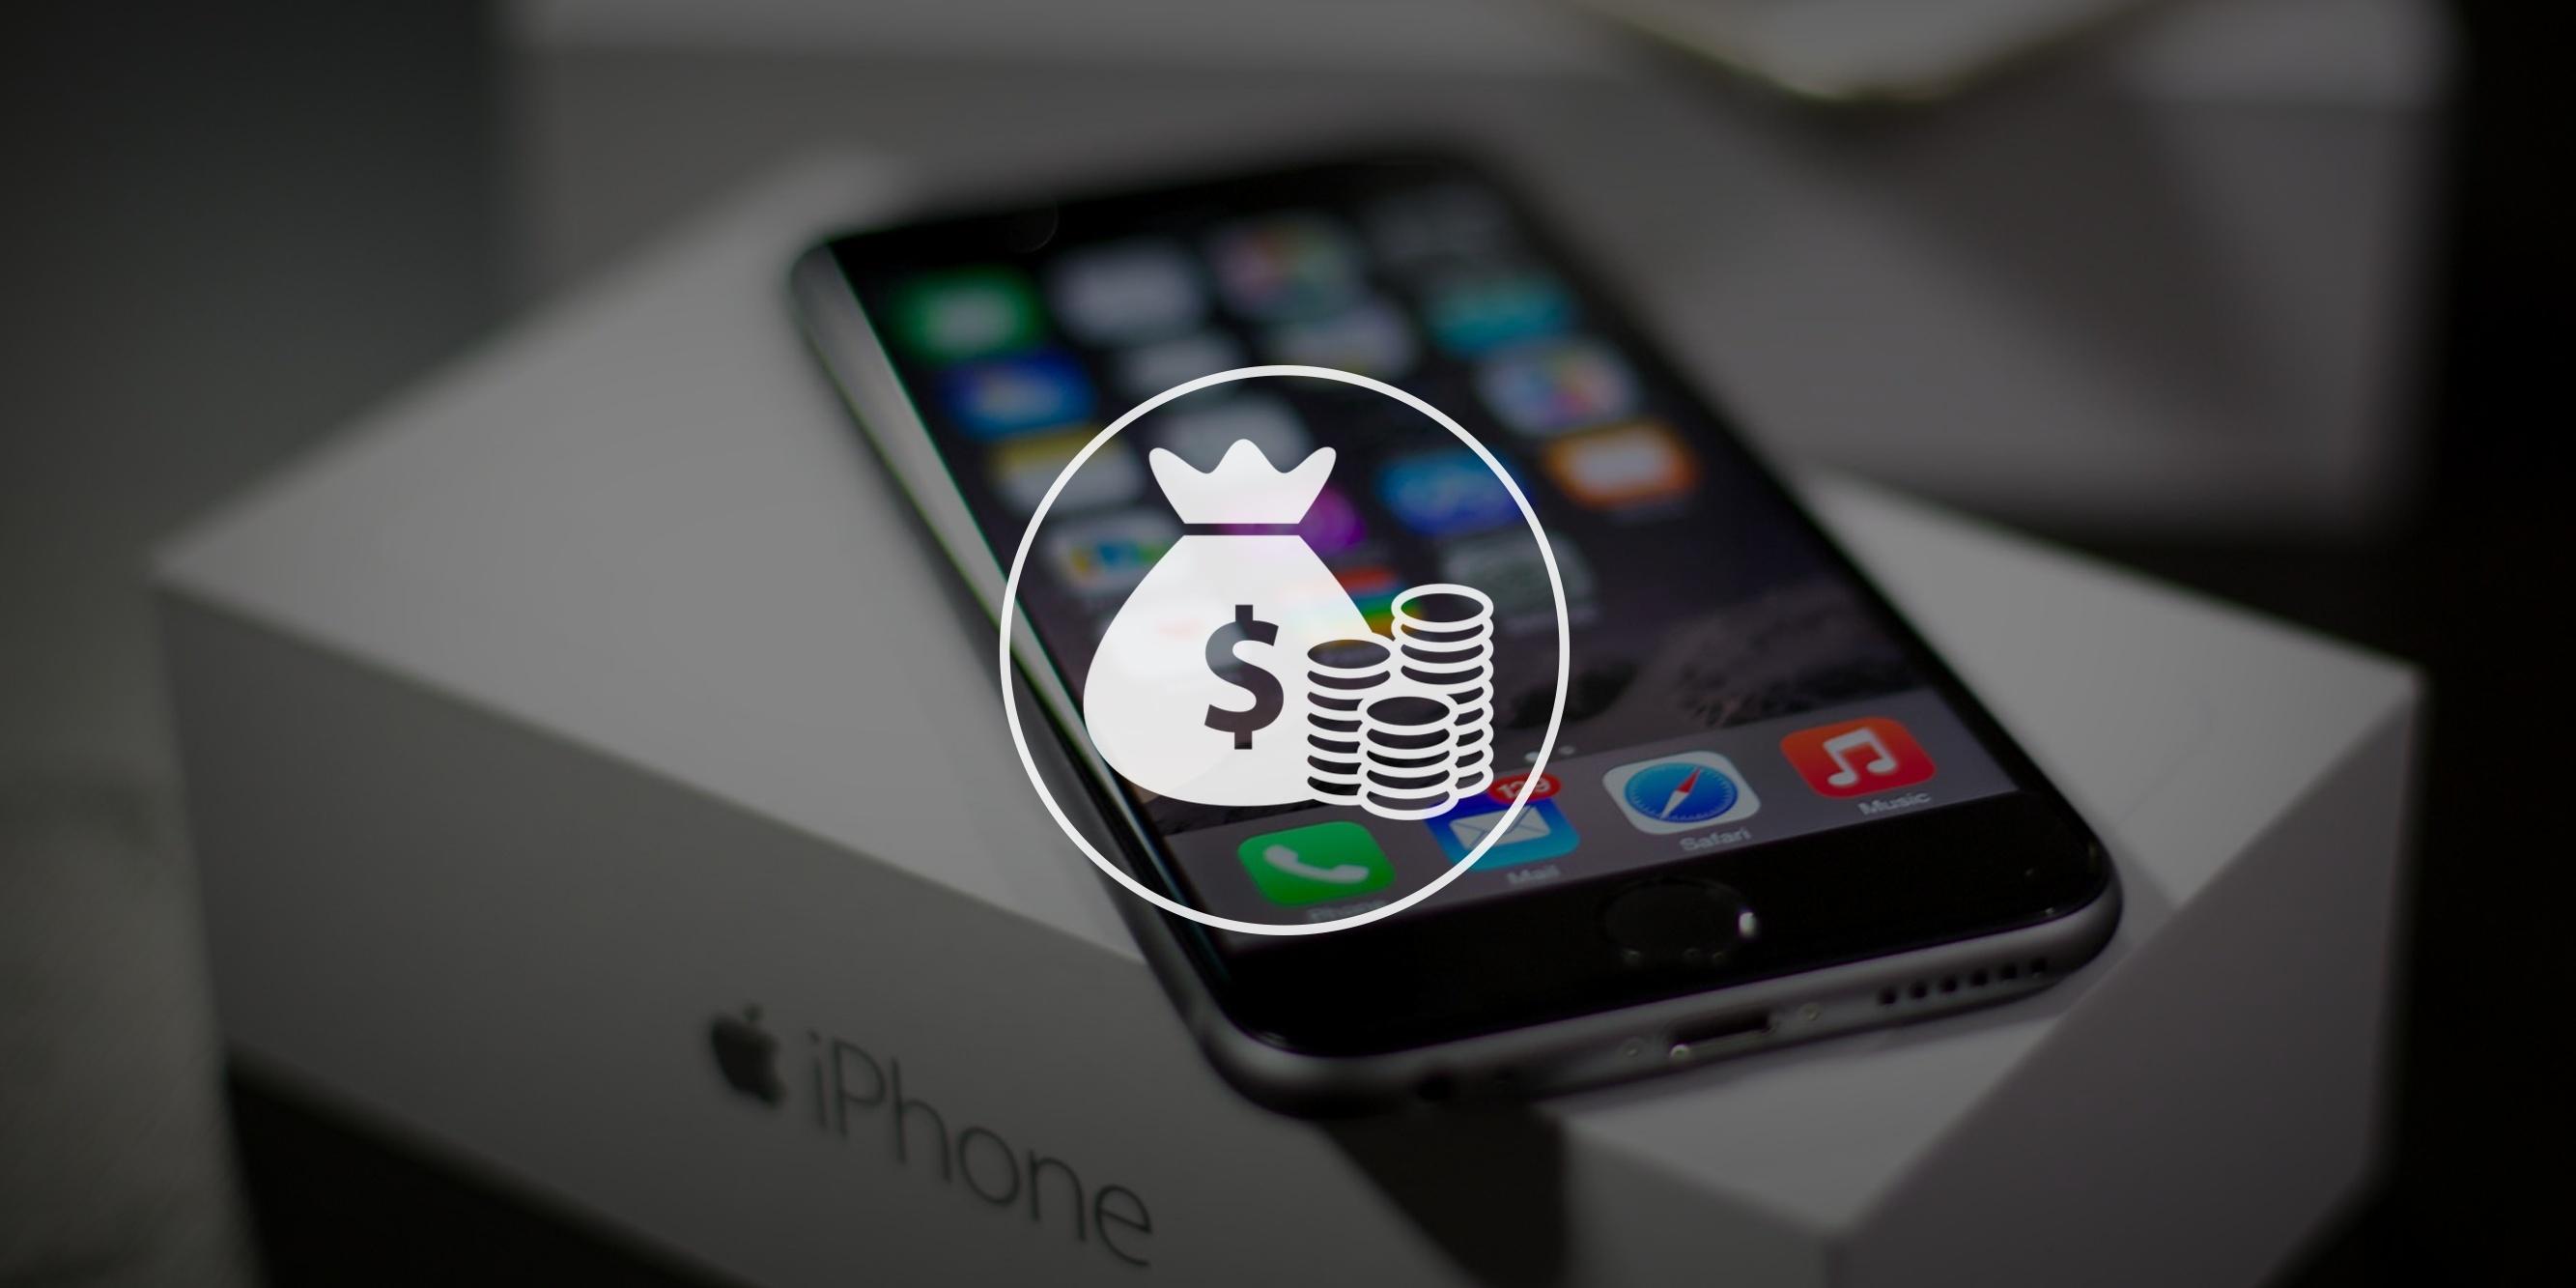 Скупка iPhone и Android смартфонов в Уфе http://www.uco.su/catalog/skupka-telefonov-v-ufa